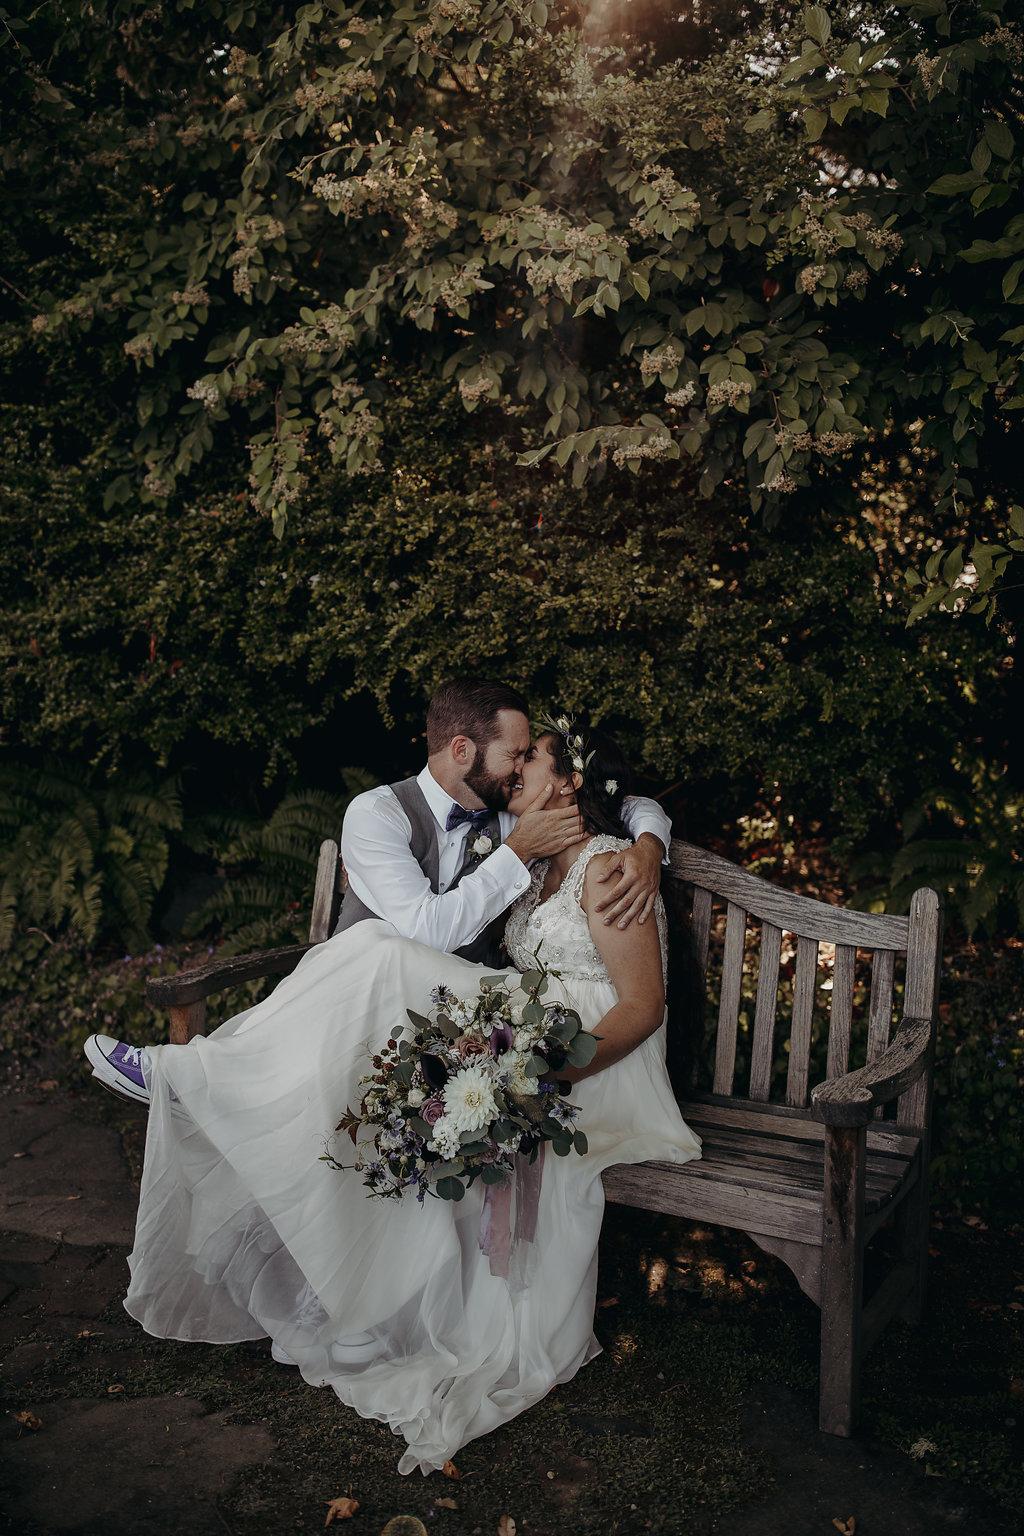 Rachel & Bryce: Elopement wedding at Lavender Hill Farm on